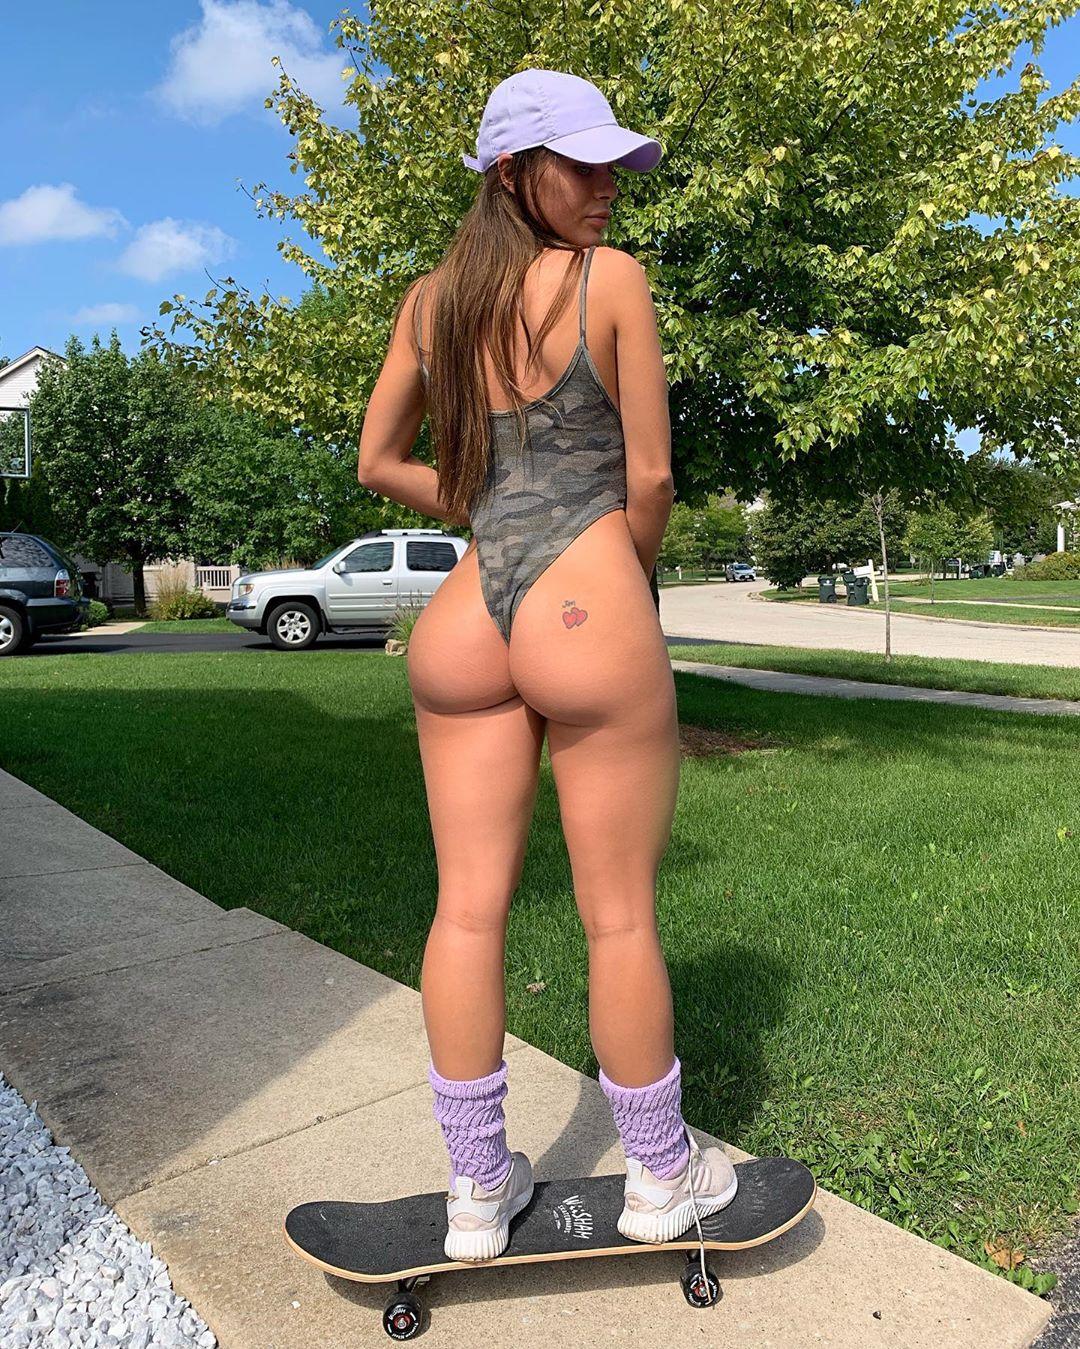 Lana rhoades trainer pornhub